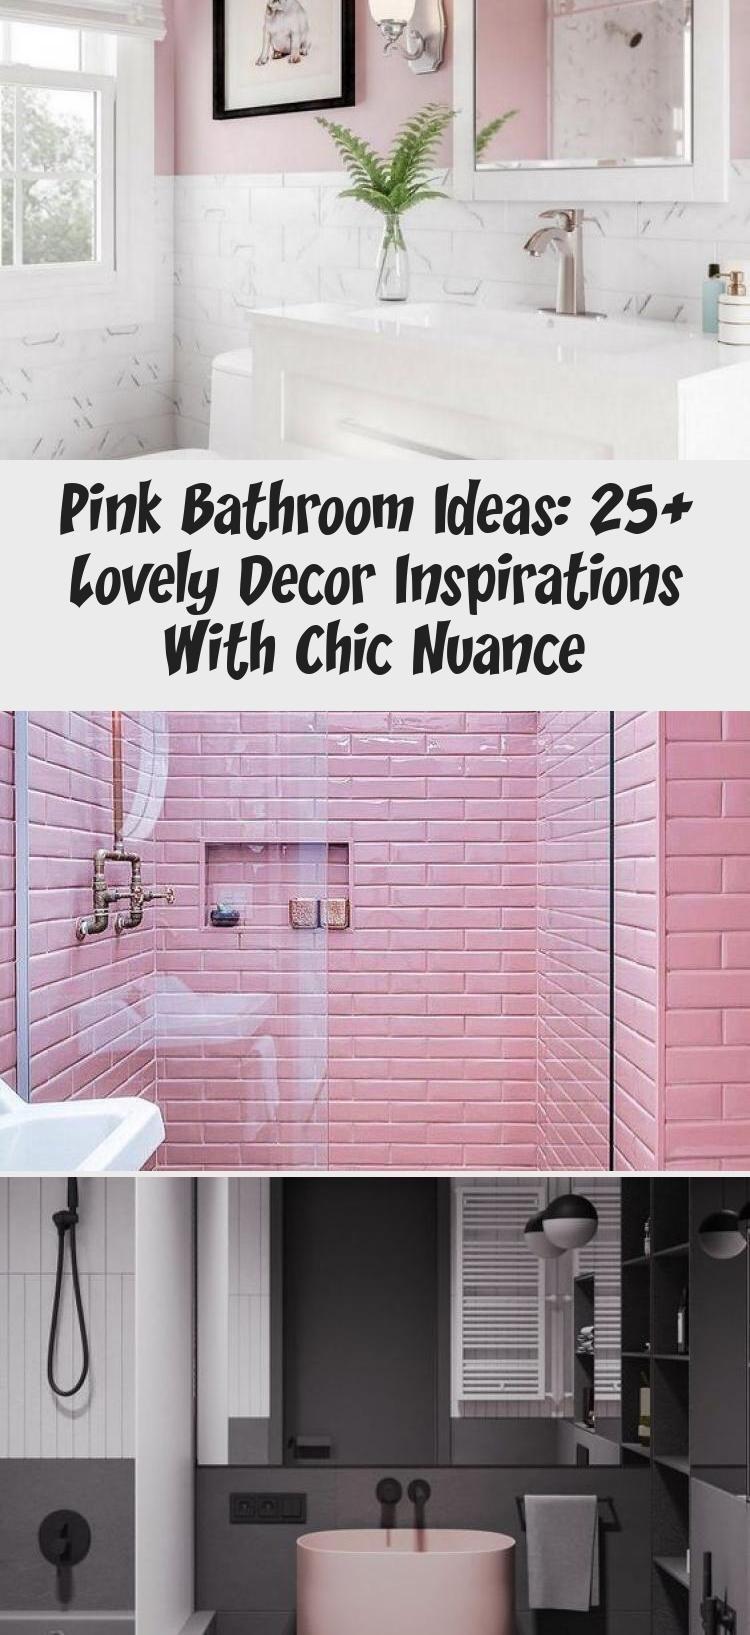 Pink Bathroom Ideas 25 Lovely Decor Inspirations With Chic Nuance Bathroom Bathroom Chic Decor Ideas Inspi In 2020 Pink Bathroom Decor Inspiration Marble House